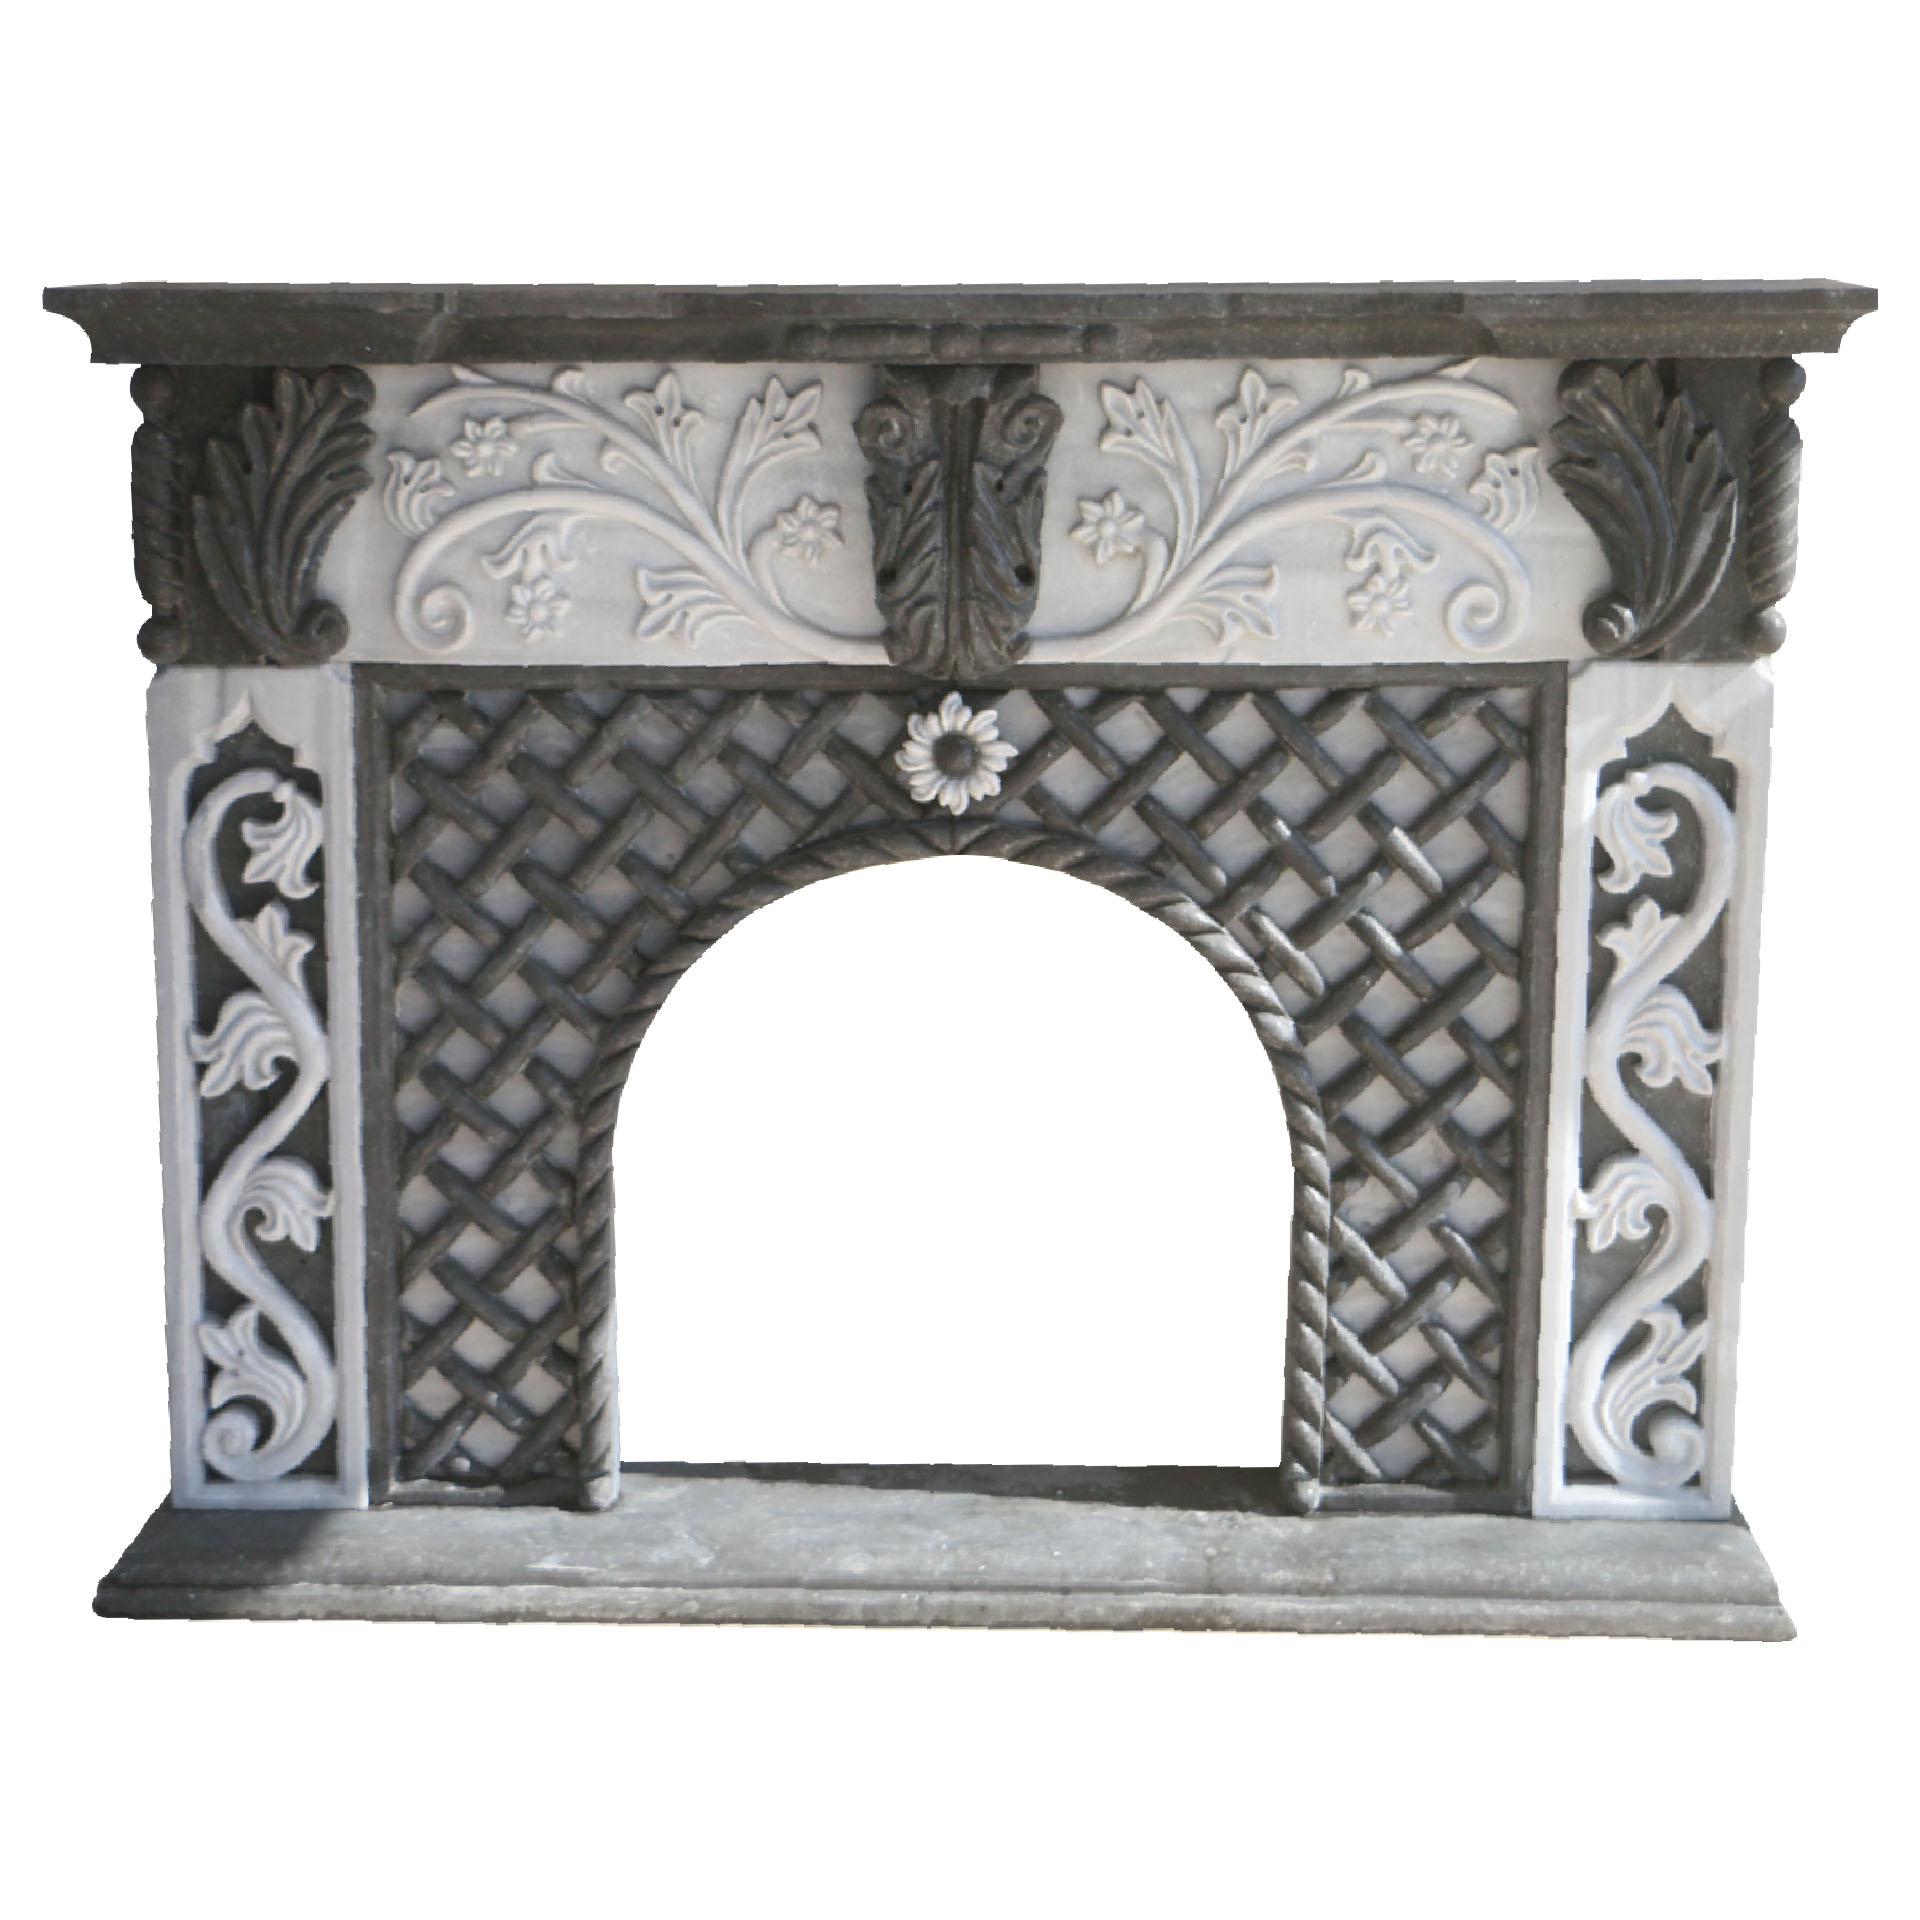 Black Basalt And Marble Fireplace Surround Pisa Stone